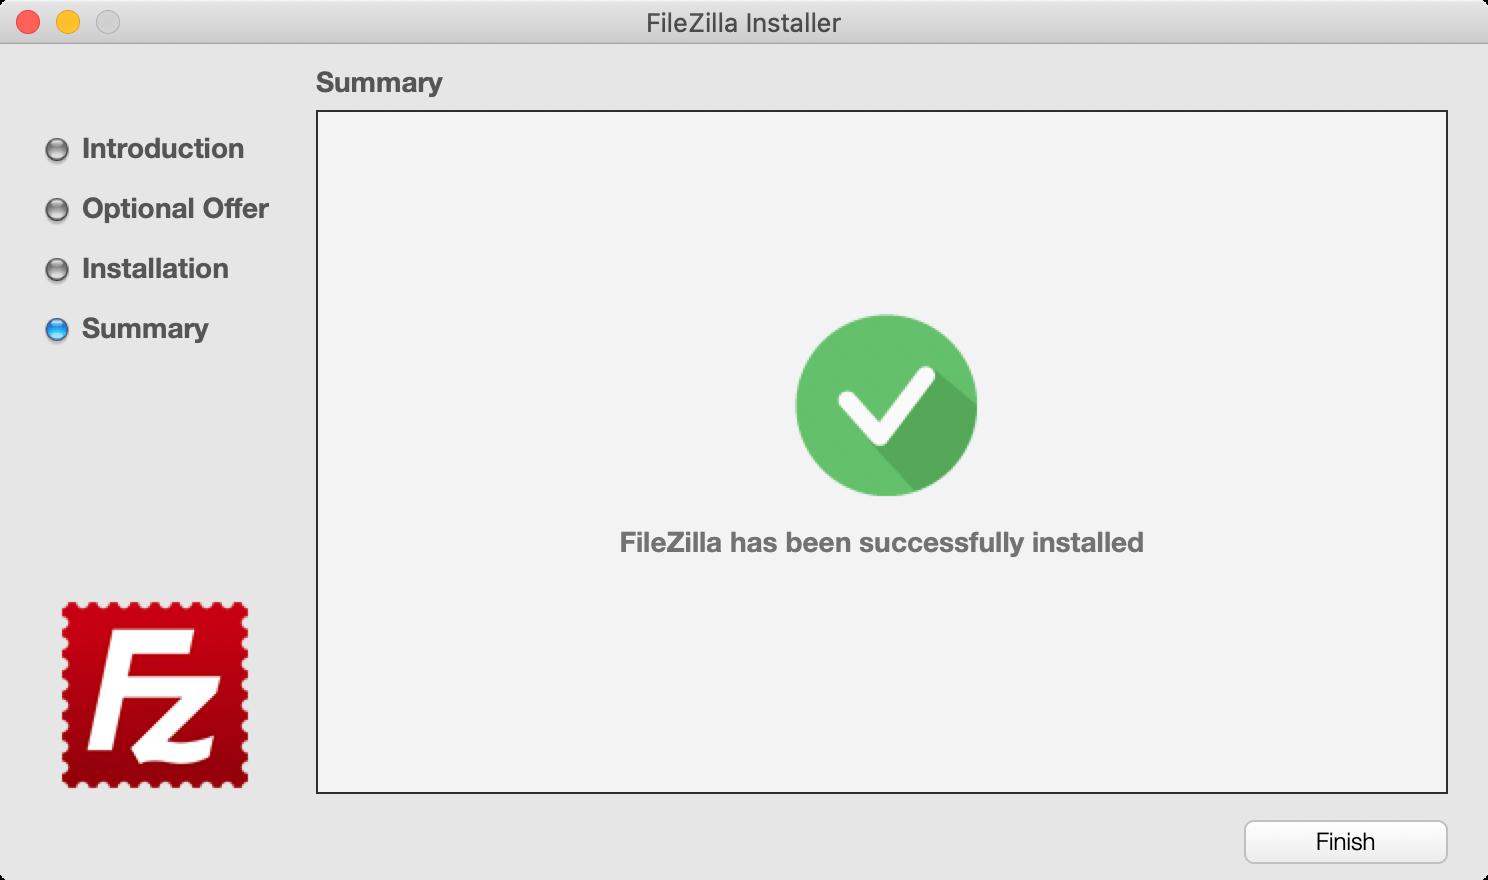 FileZillaのインストール完了